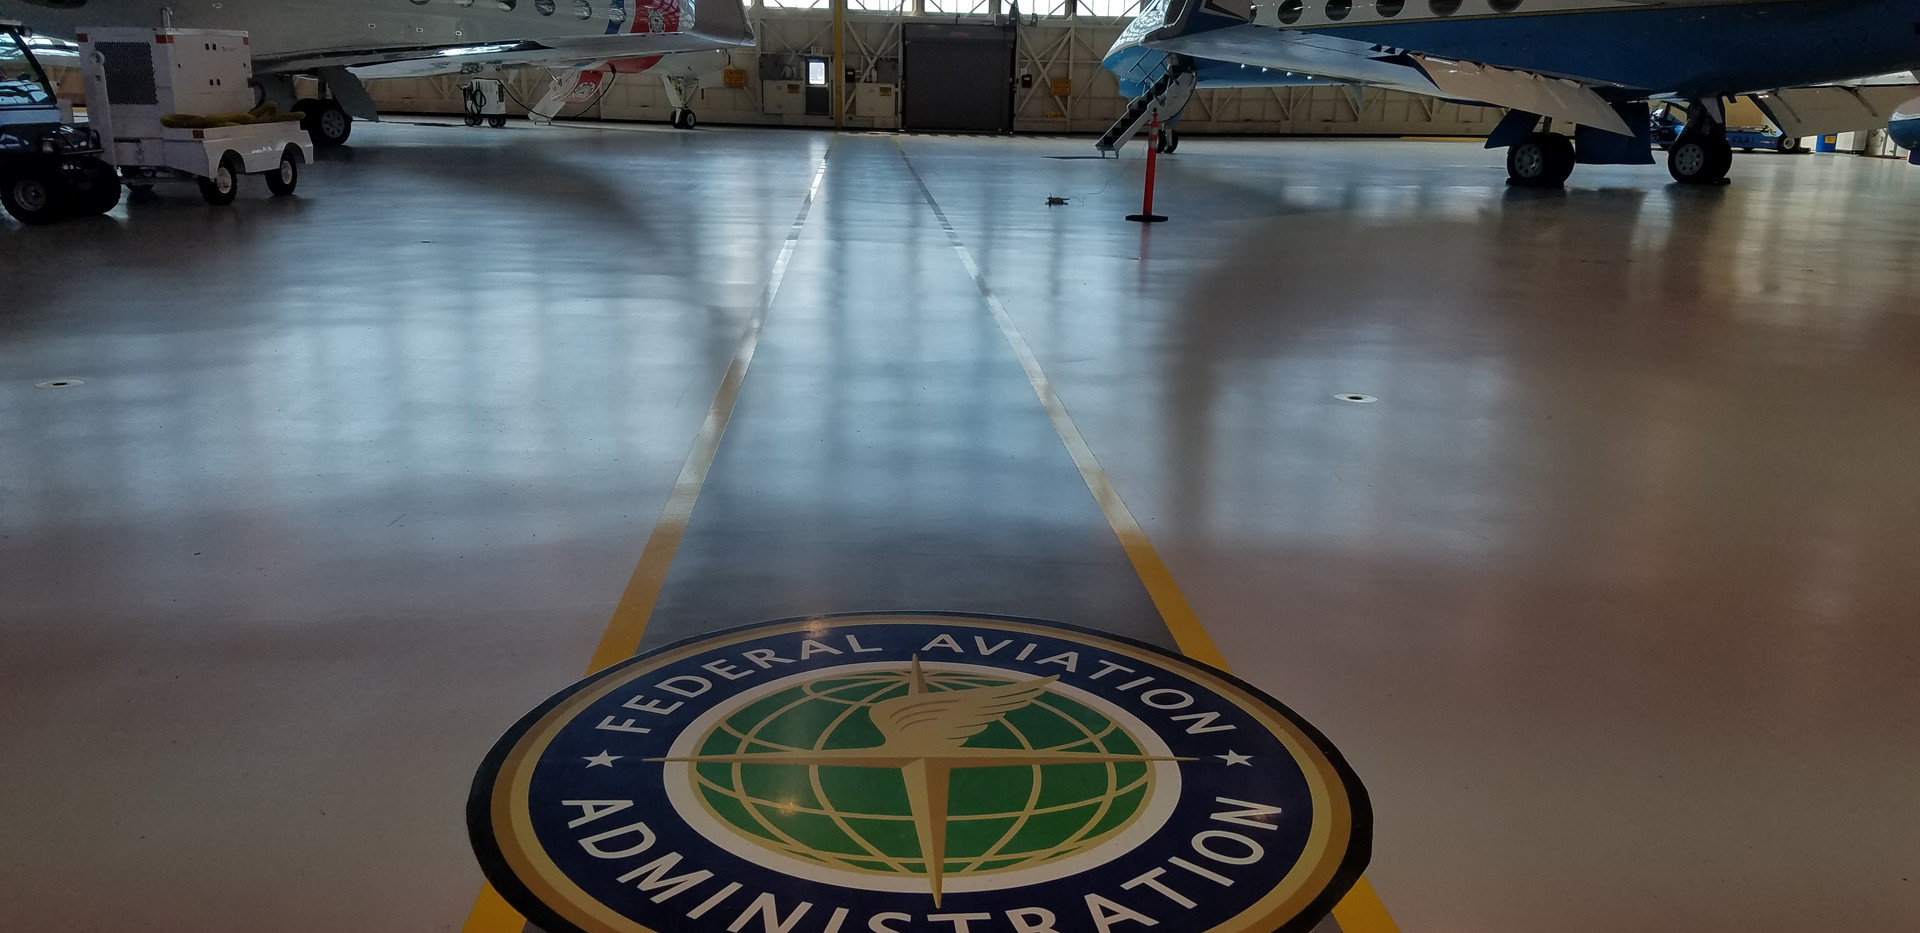 FAA Hangar 6 at DCA